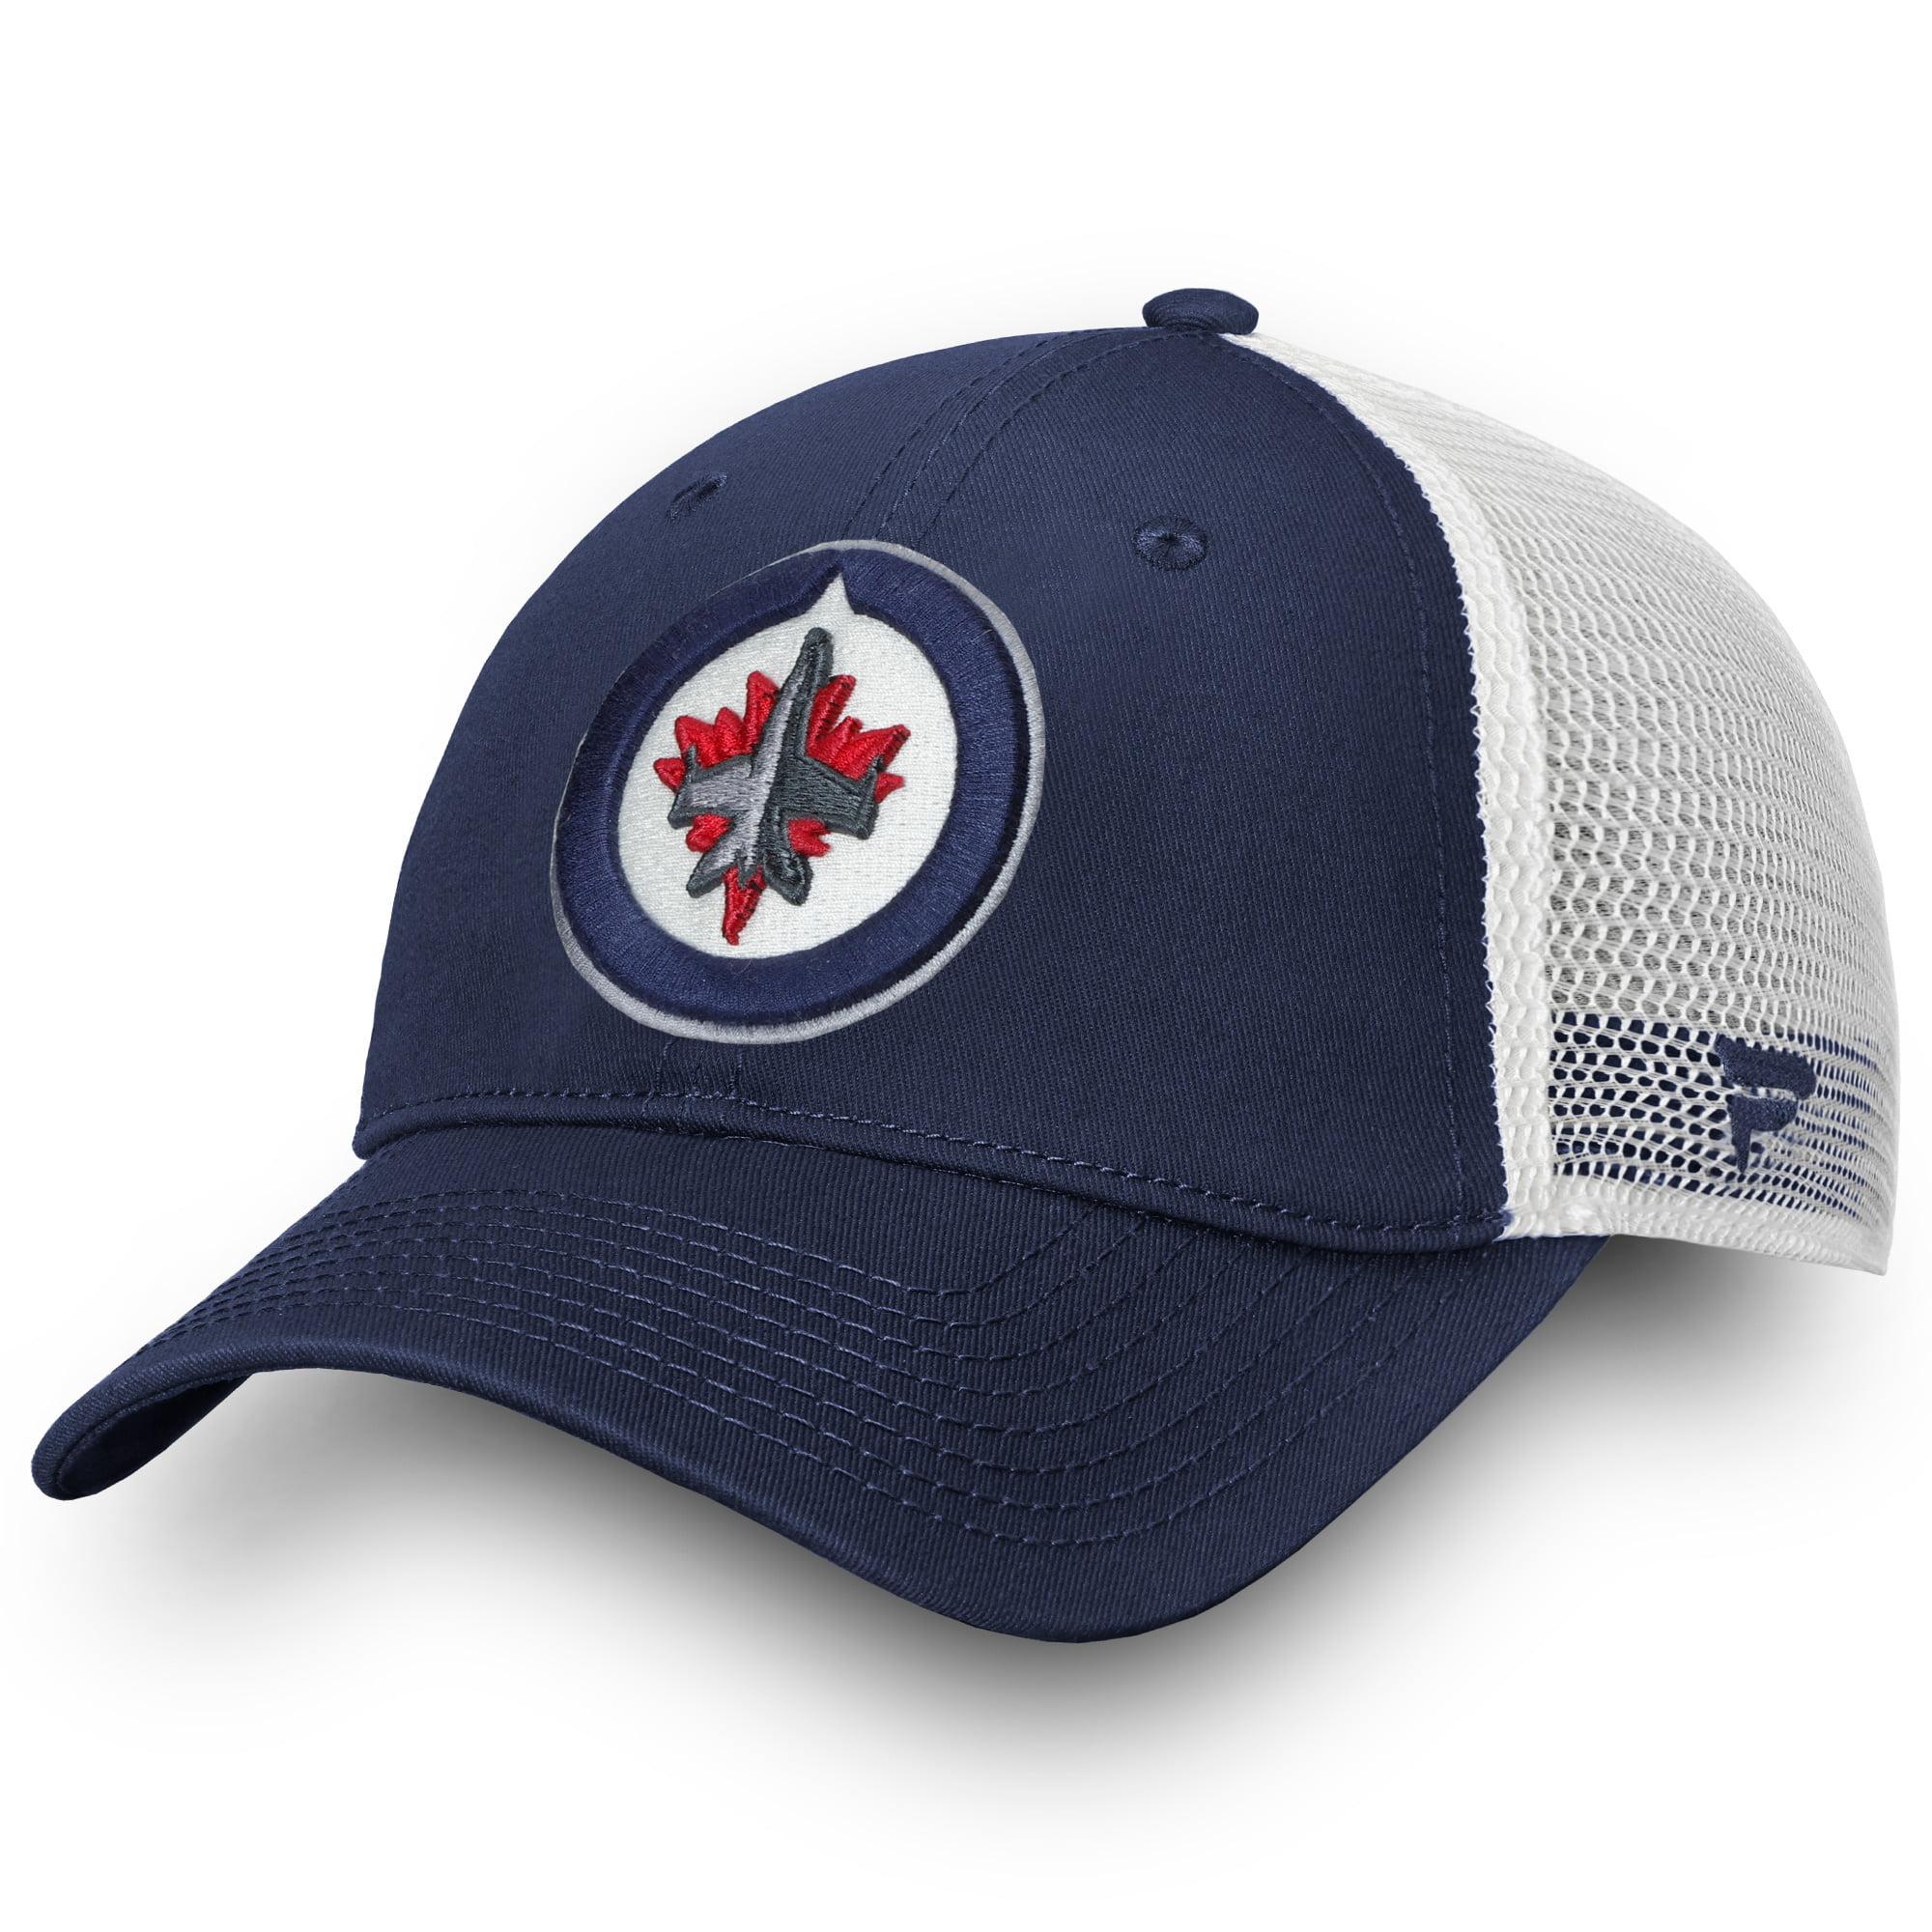 Winnipeg Jets Fanatics Branded Core Trucker II Snapback Adjustable Hat - Navy - OSFA